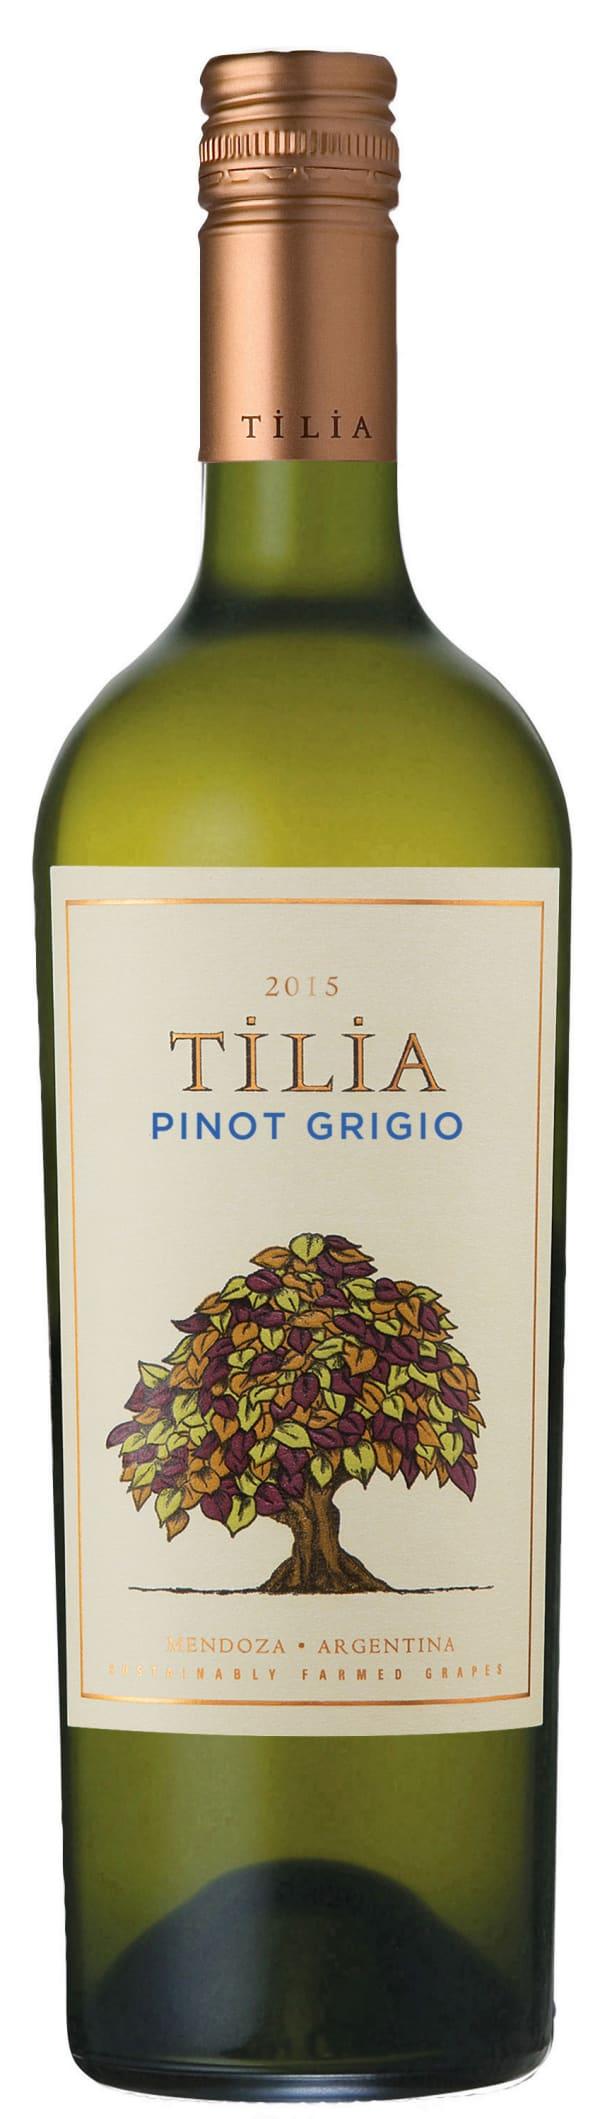 Tilia Pinot Grigio 2015